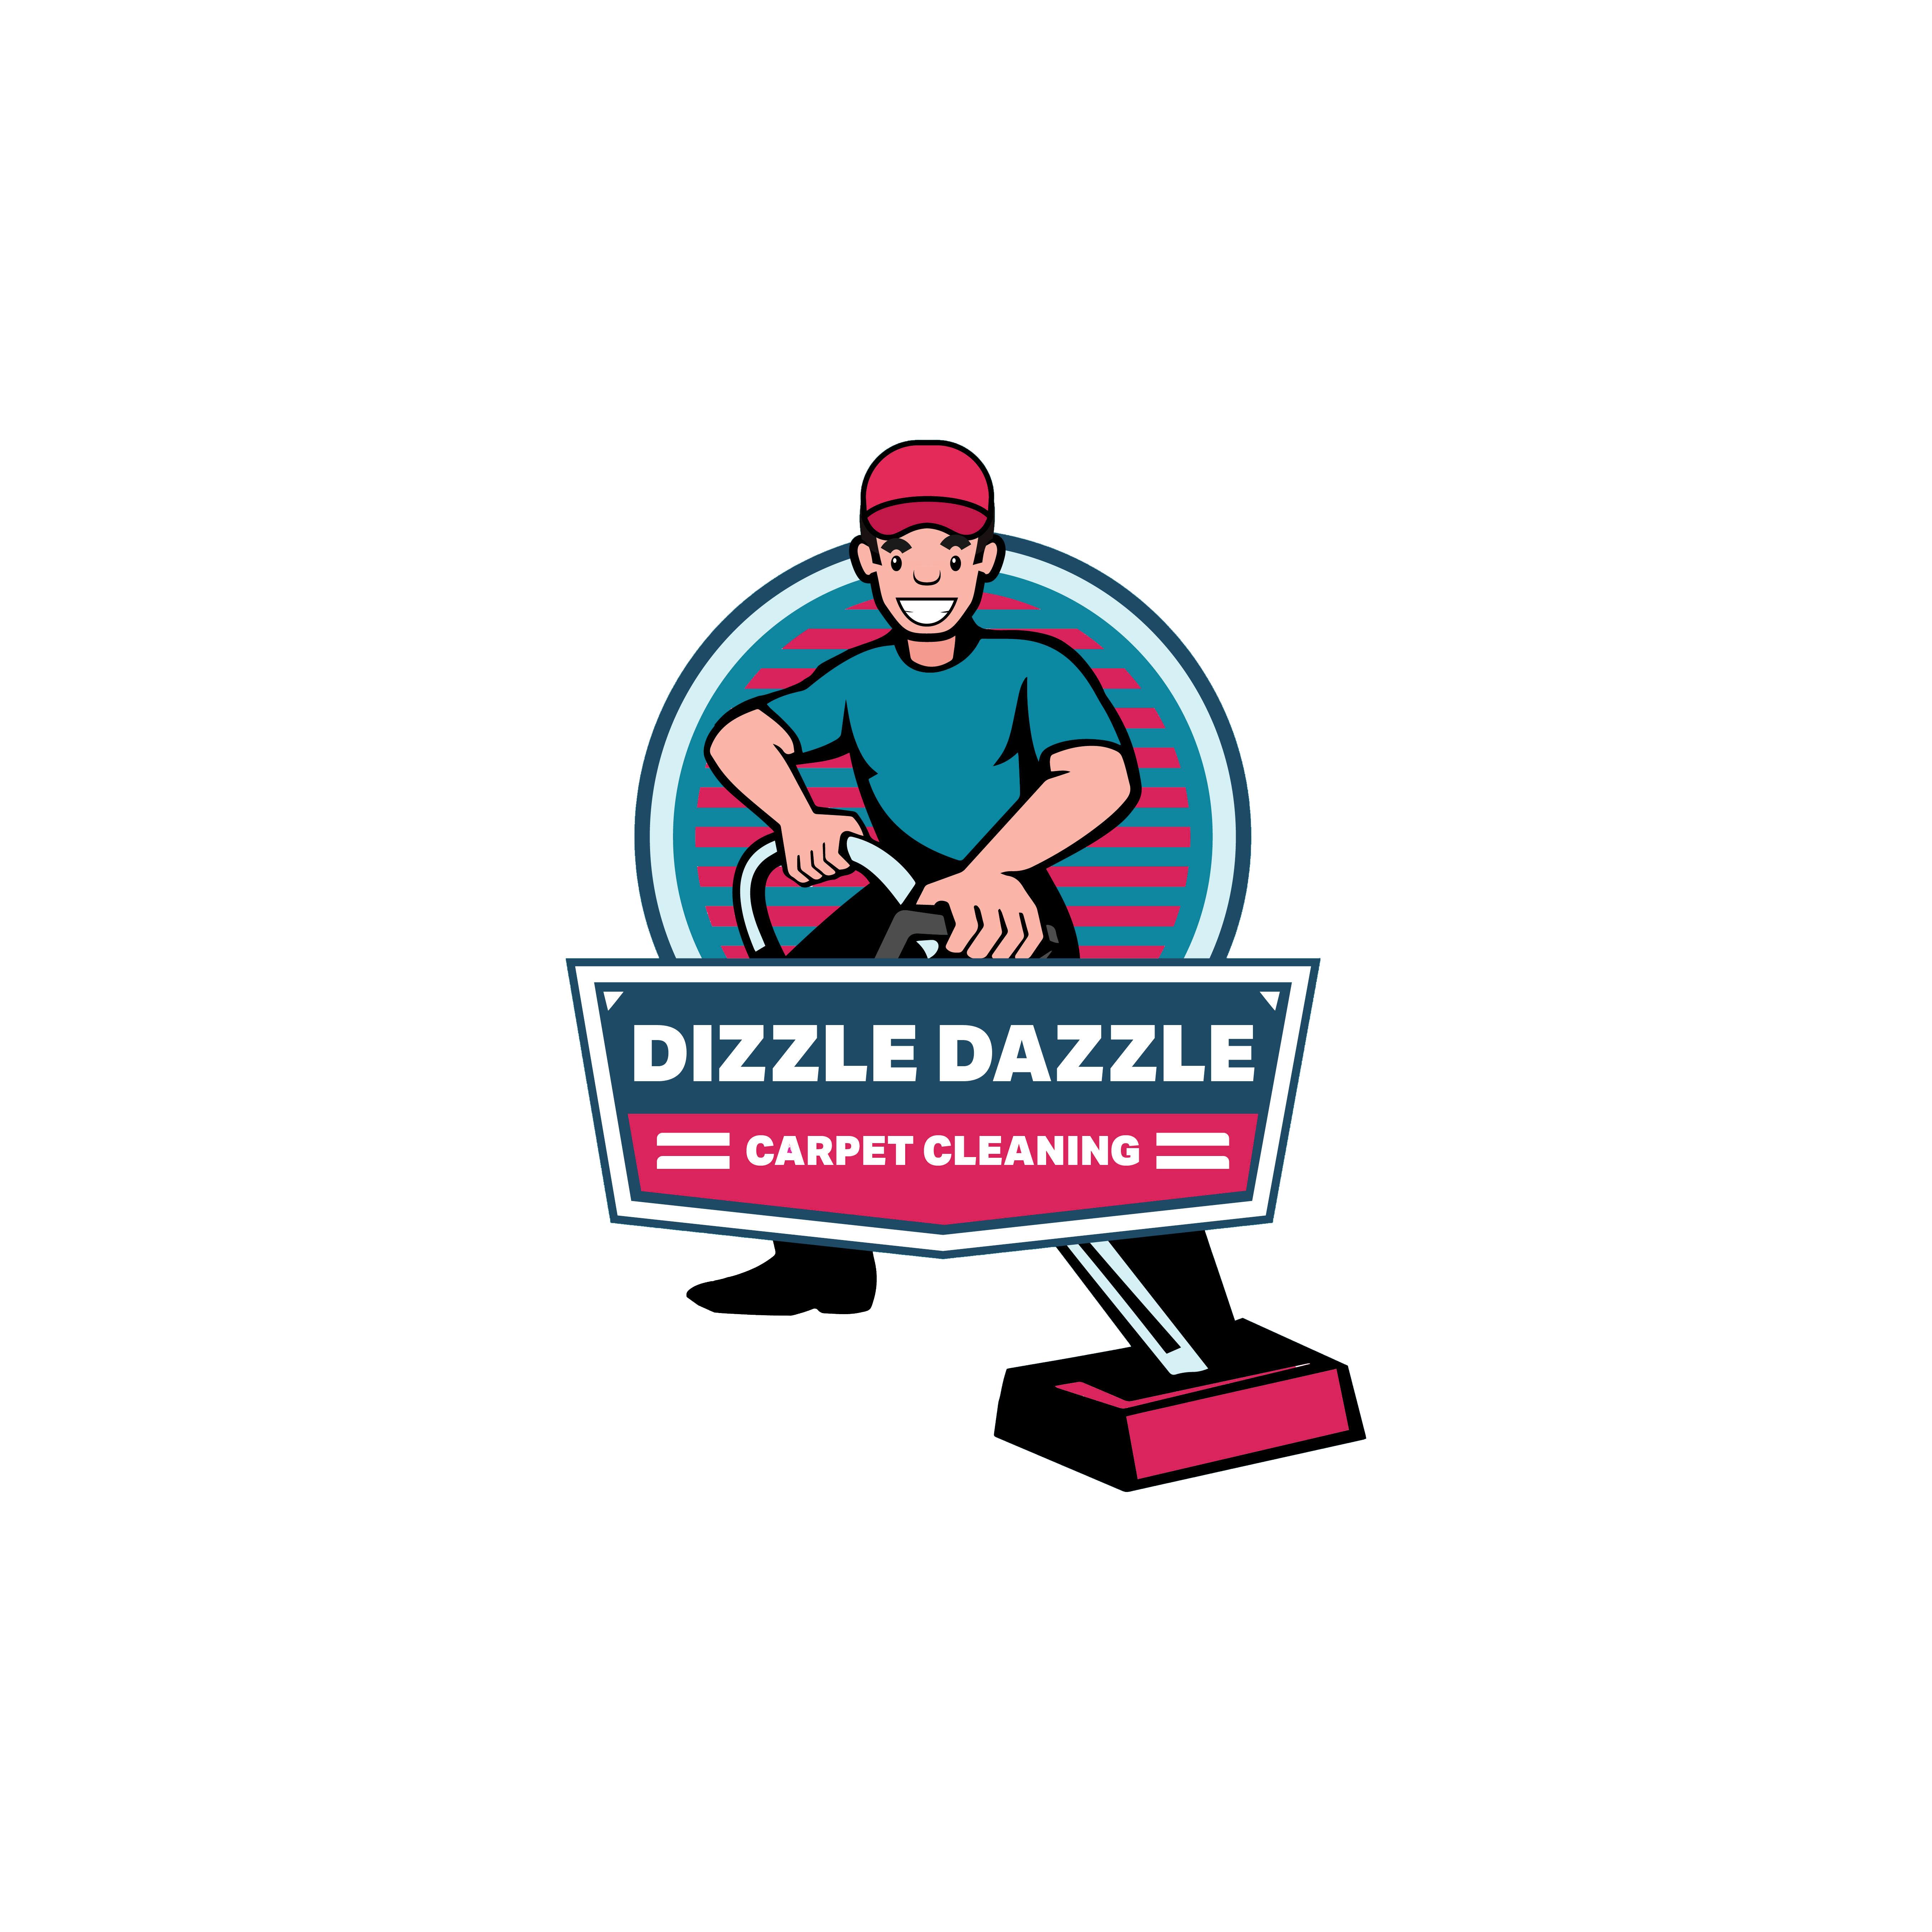 Dizzle Dazzle